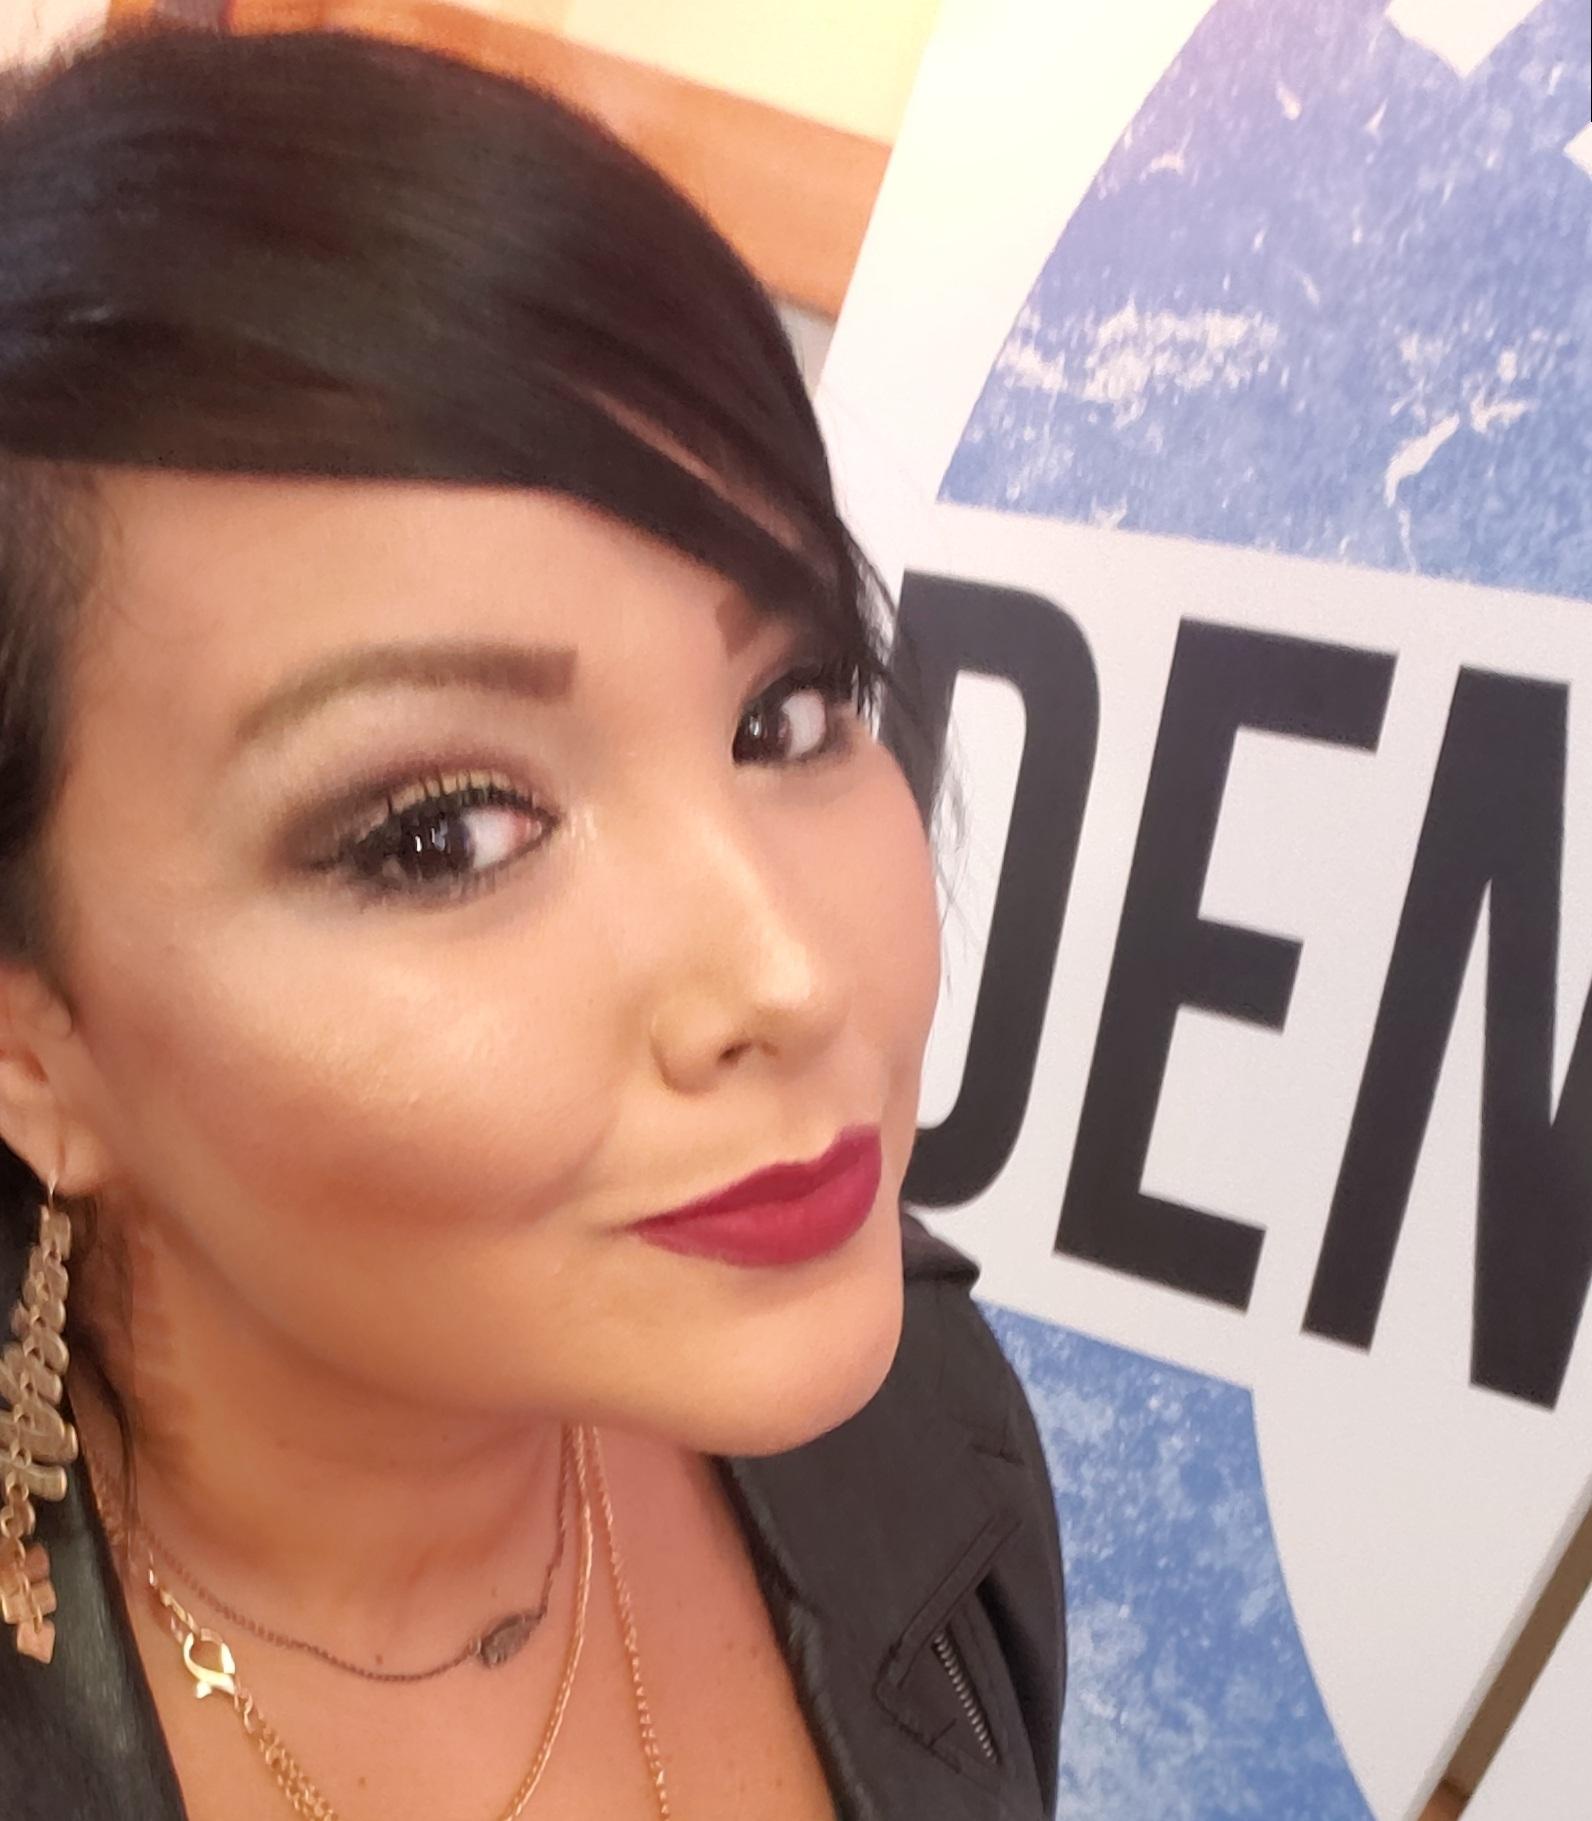 Ellie Gonzalez / Diva Girl Ellie / The Denton Diva  {she/her}  poetry, radio   Producer/ Radio show host of The Denton Vibe, Founder of Lost Poet Lounge.  Diva Girl Ellie:  Instagram  Lost Poet Lounge:  Instagram  /  Facebook  The Denton Vibe:  Instagram  /  Facebook